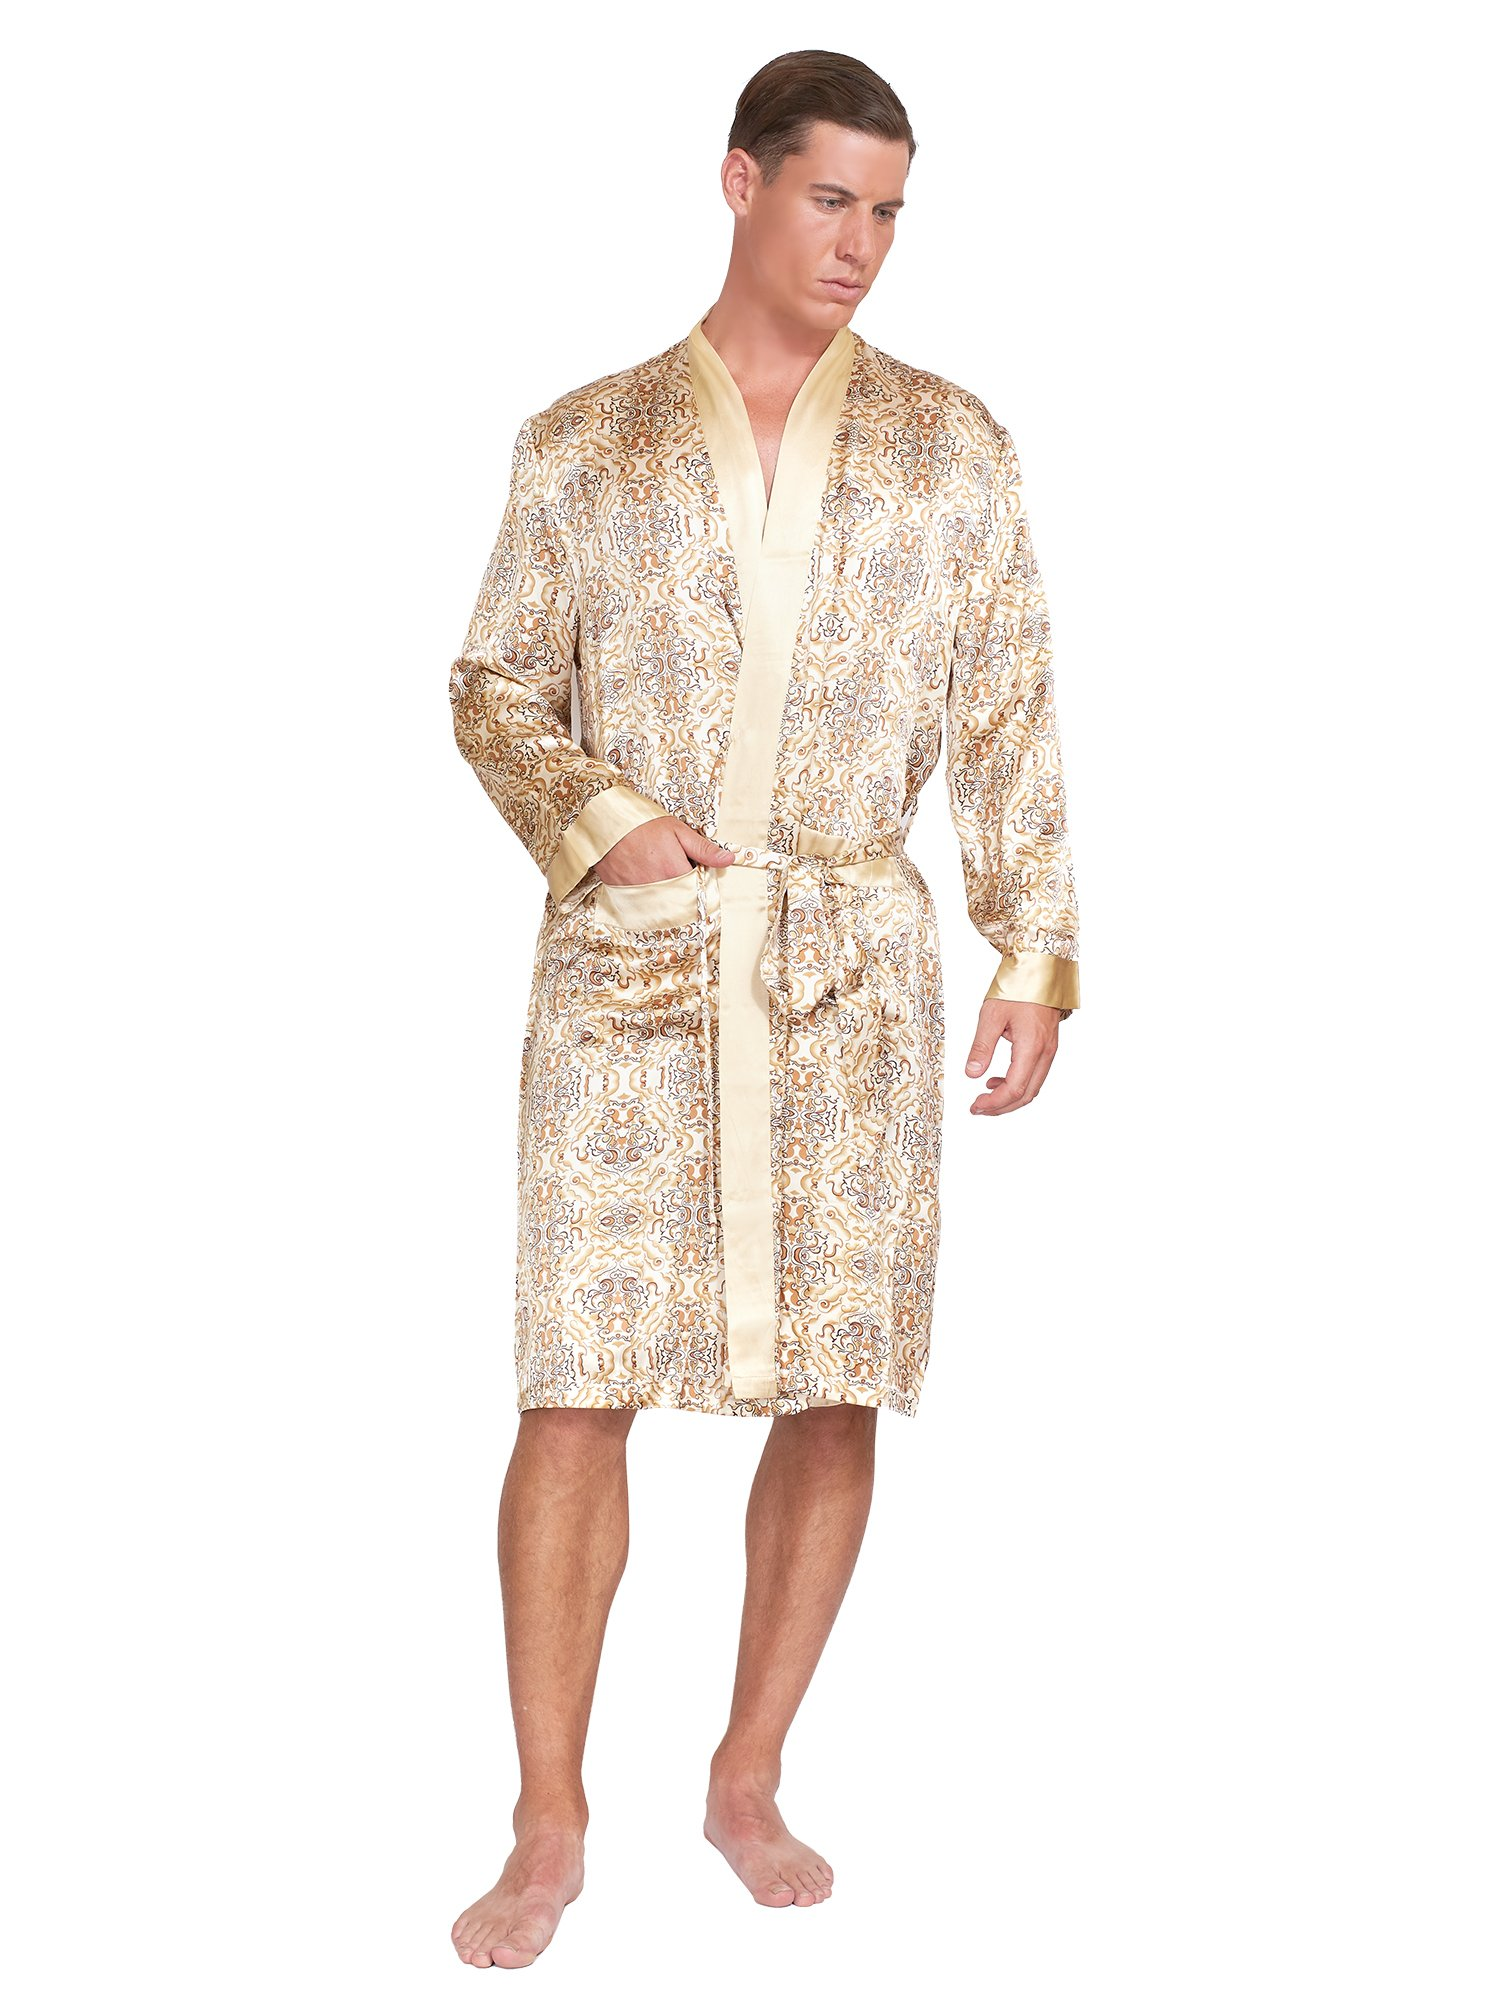 MYK Mens Paisley Printed Silk Robes - With Gift Box (M, Gold)